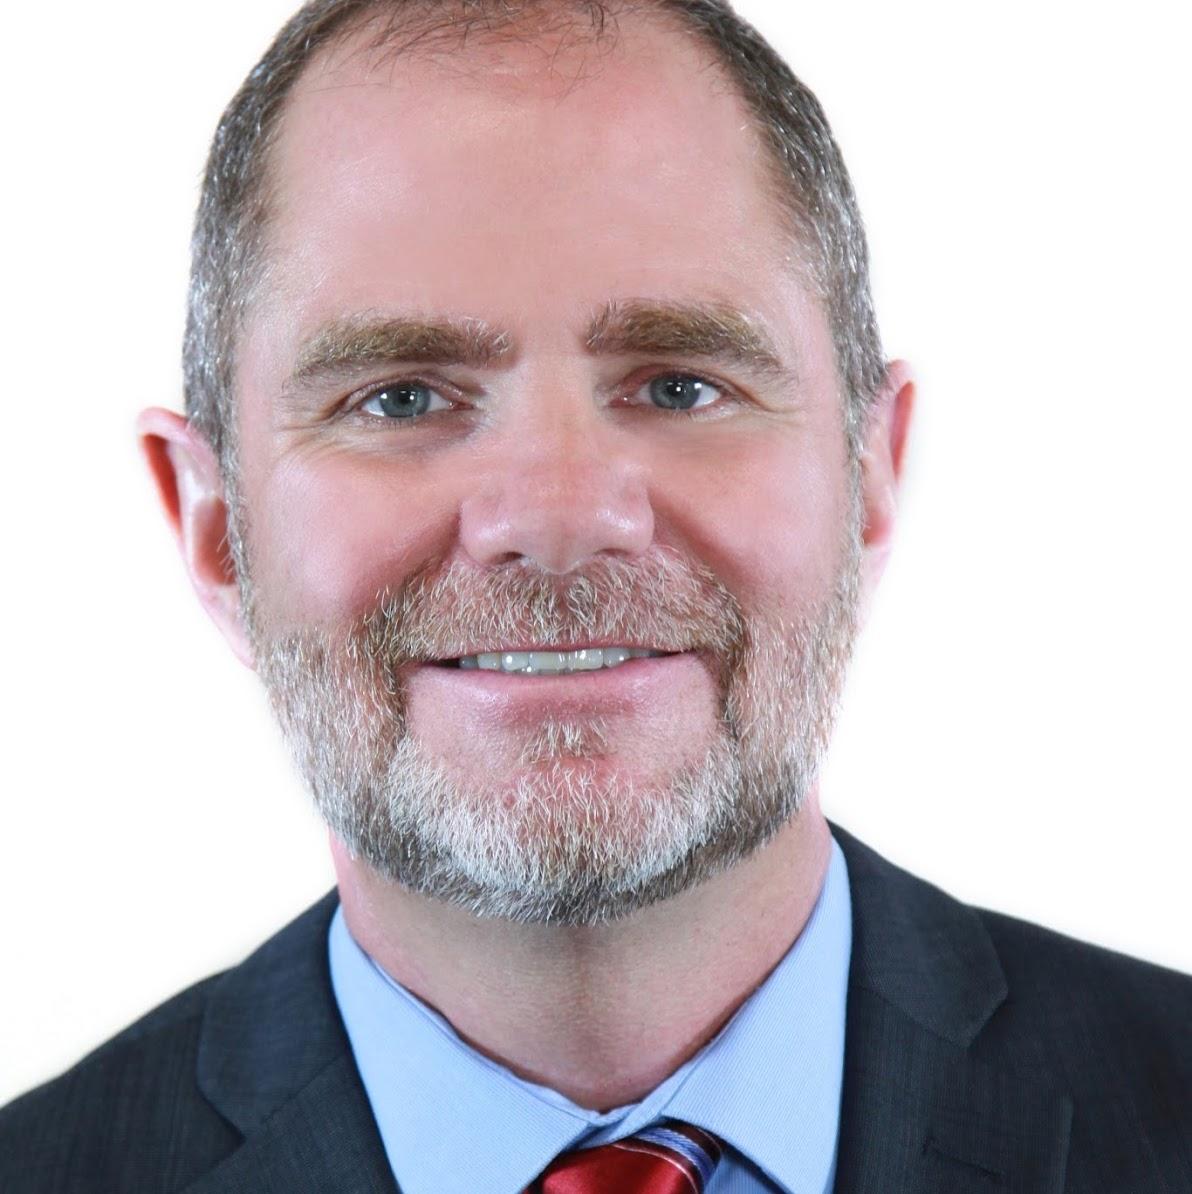 Douglas Payne, President